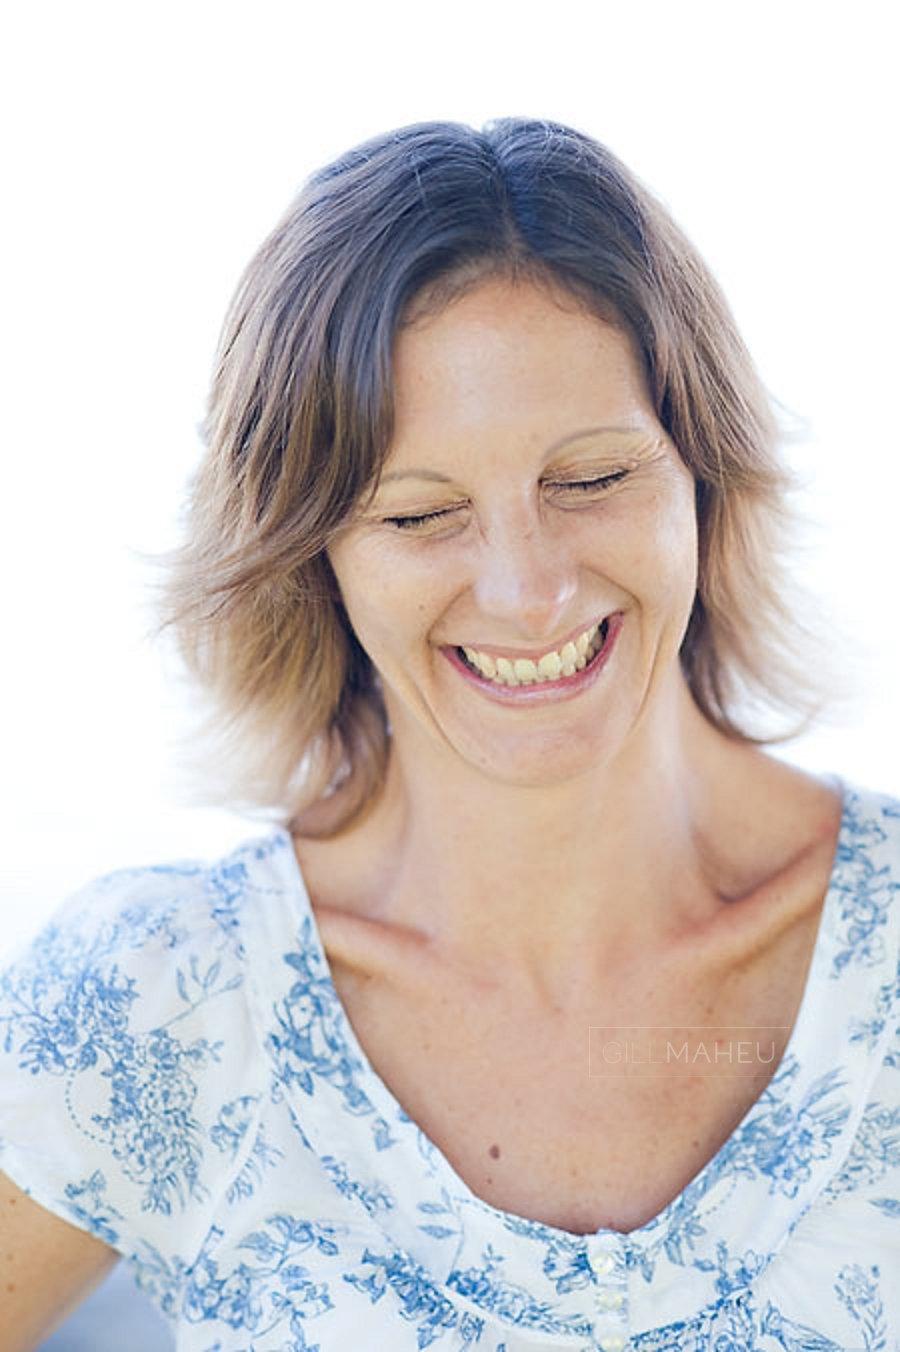 https://gillmaheu.com/wp-content/uploads/2015/01/women-femmes-portrait-photographe-gill-maheu-photography-2015_0033.jpg